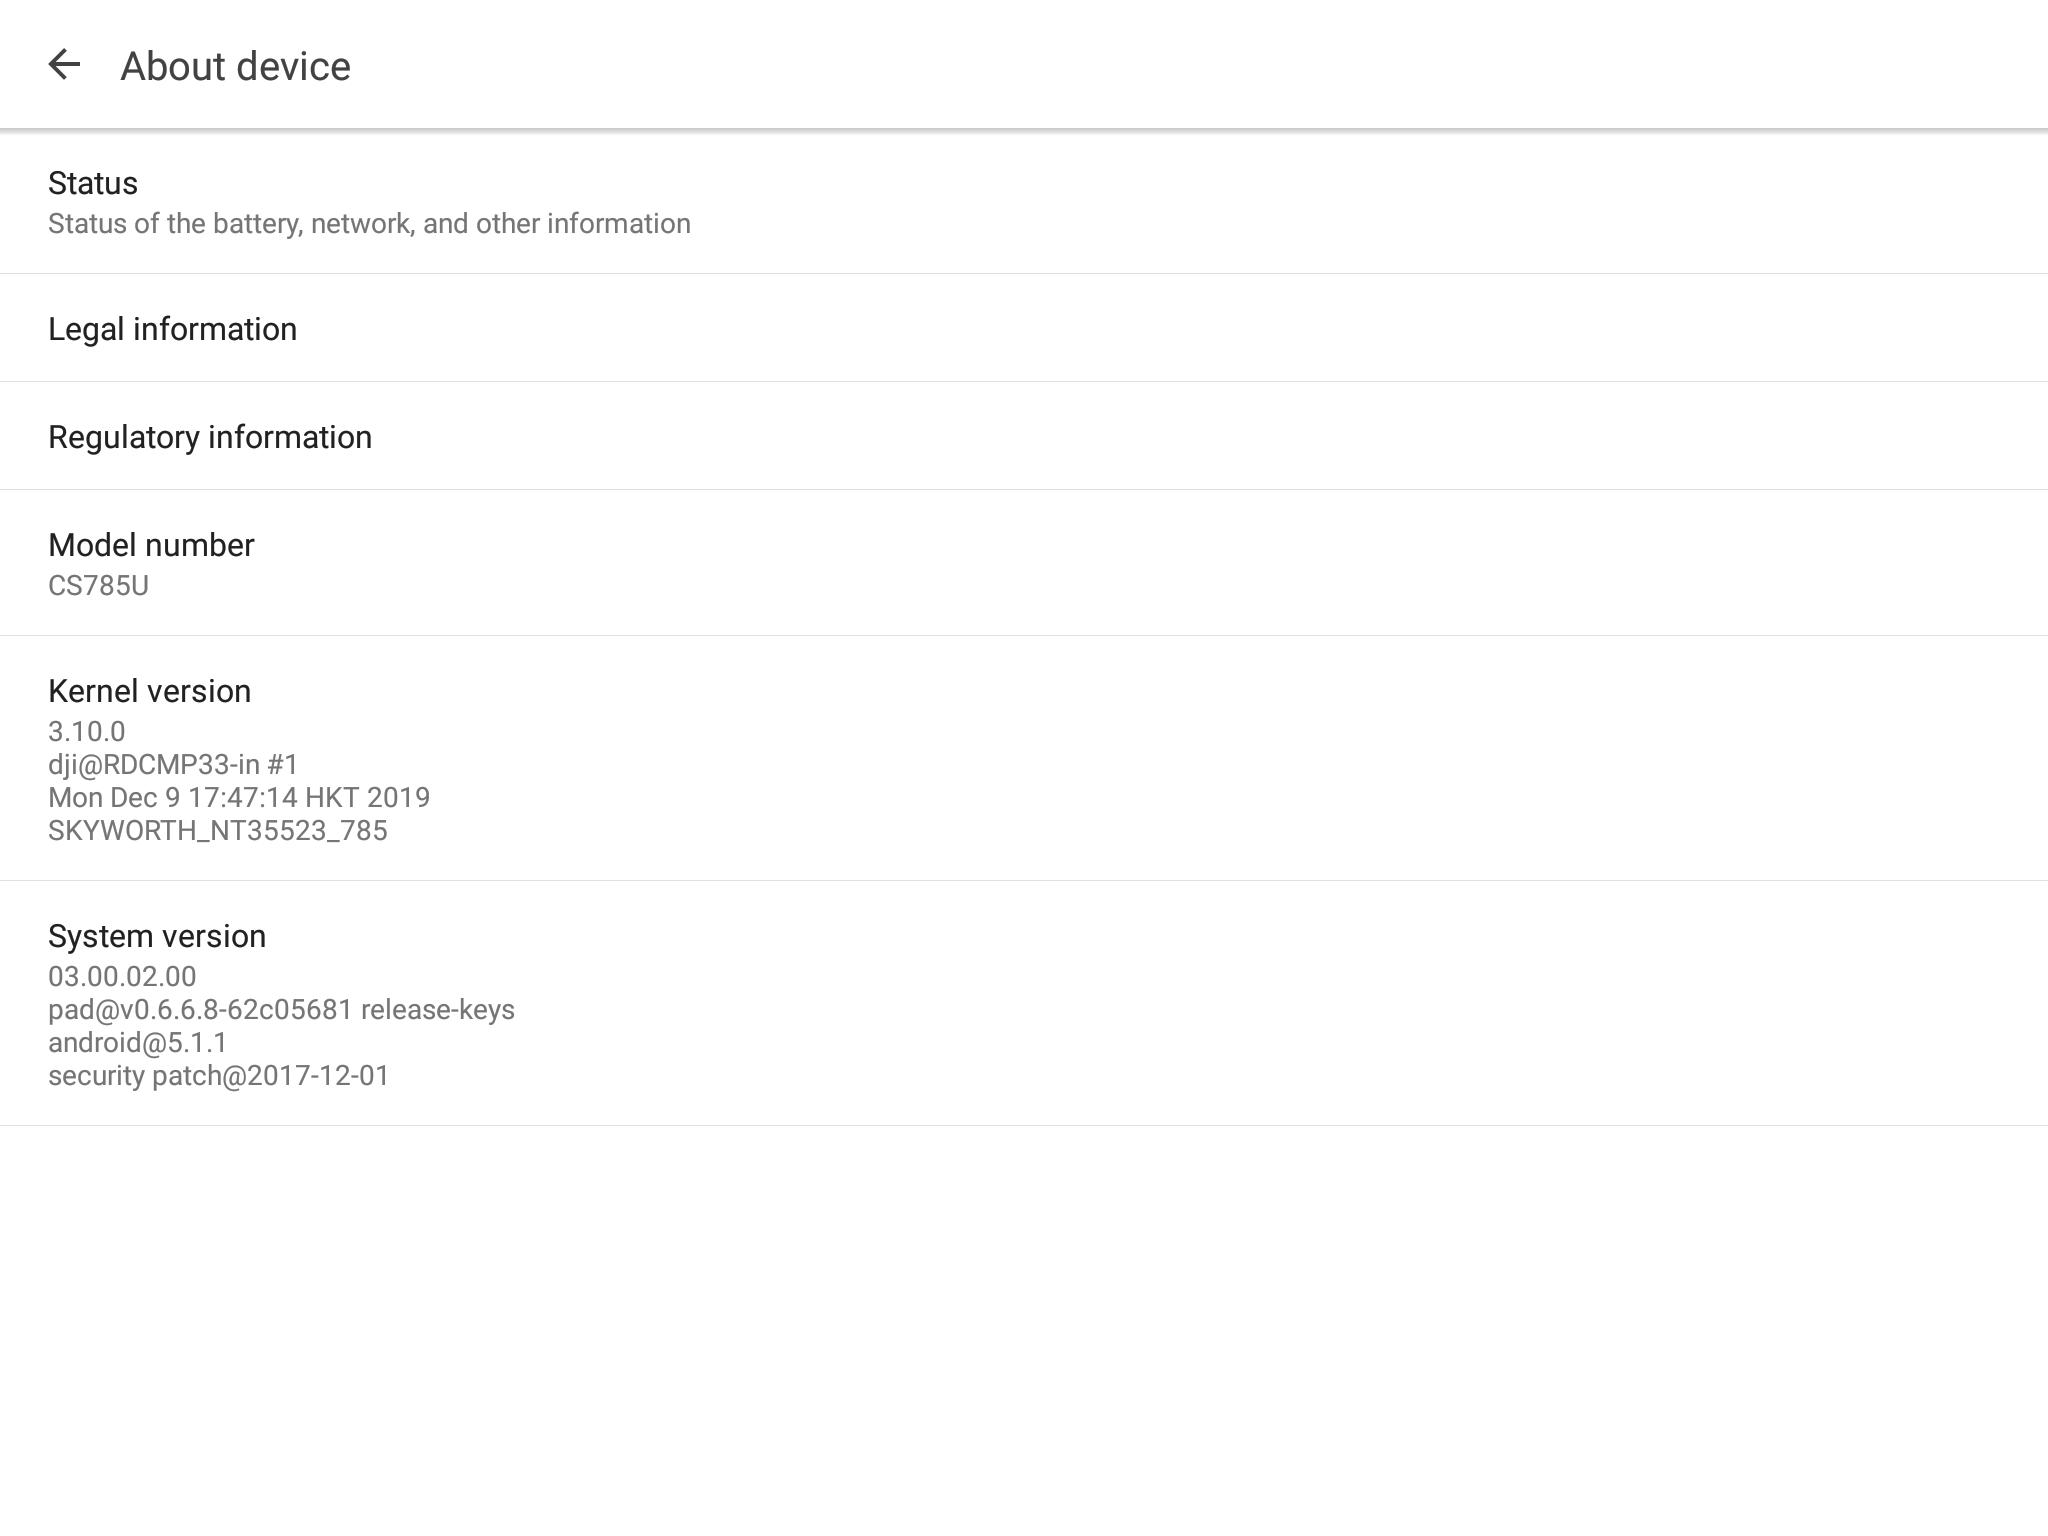 Screenshot_2020-06-25-07-05-20.png